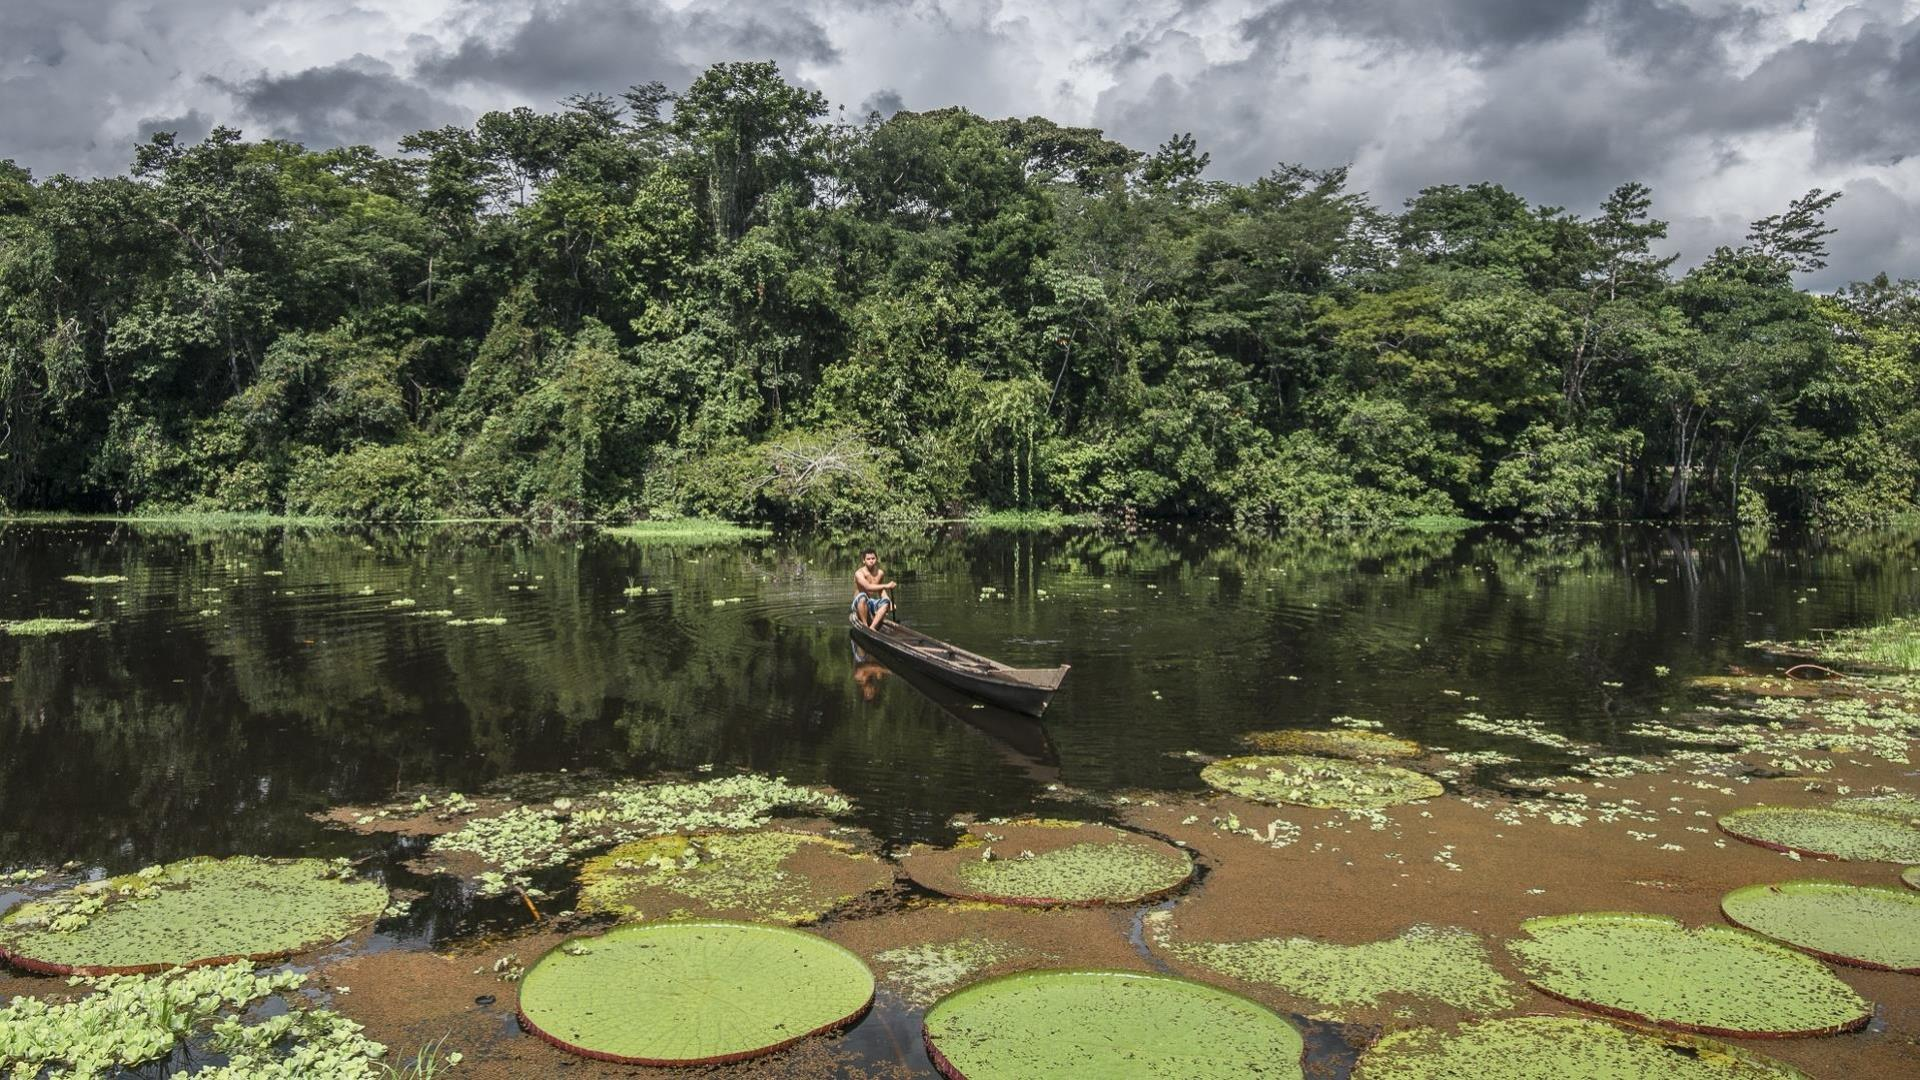 Brasilien Amazonas: 2 Tage Reisebaustein - Juma Amazon Lodge Jacana Paket